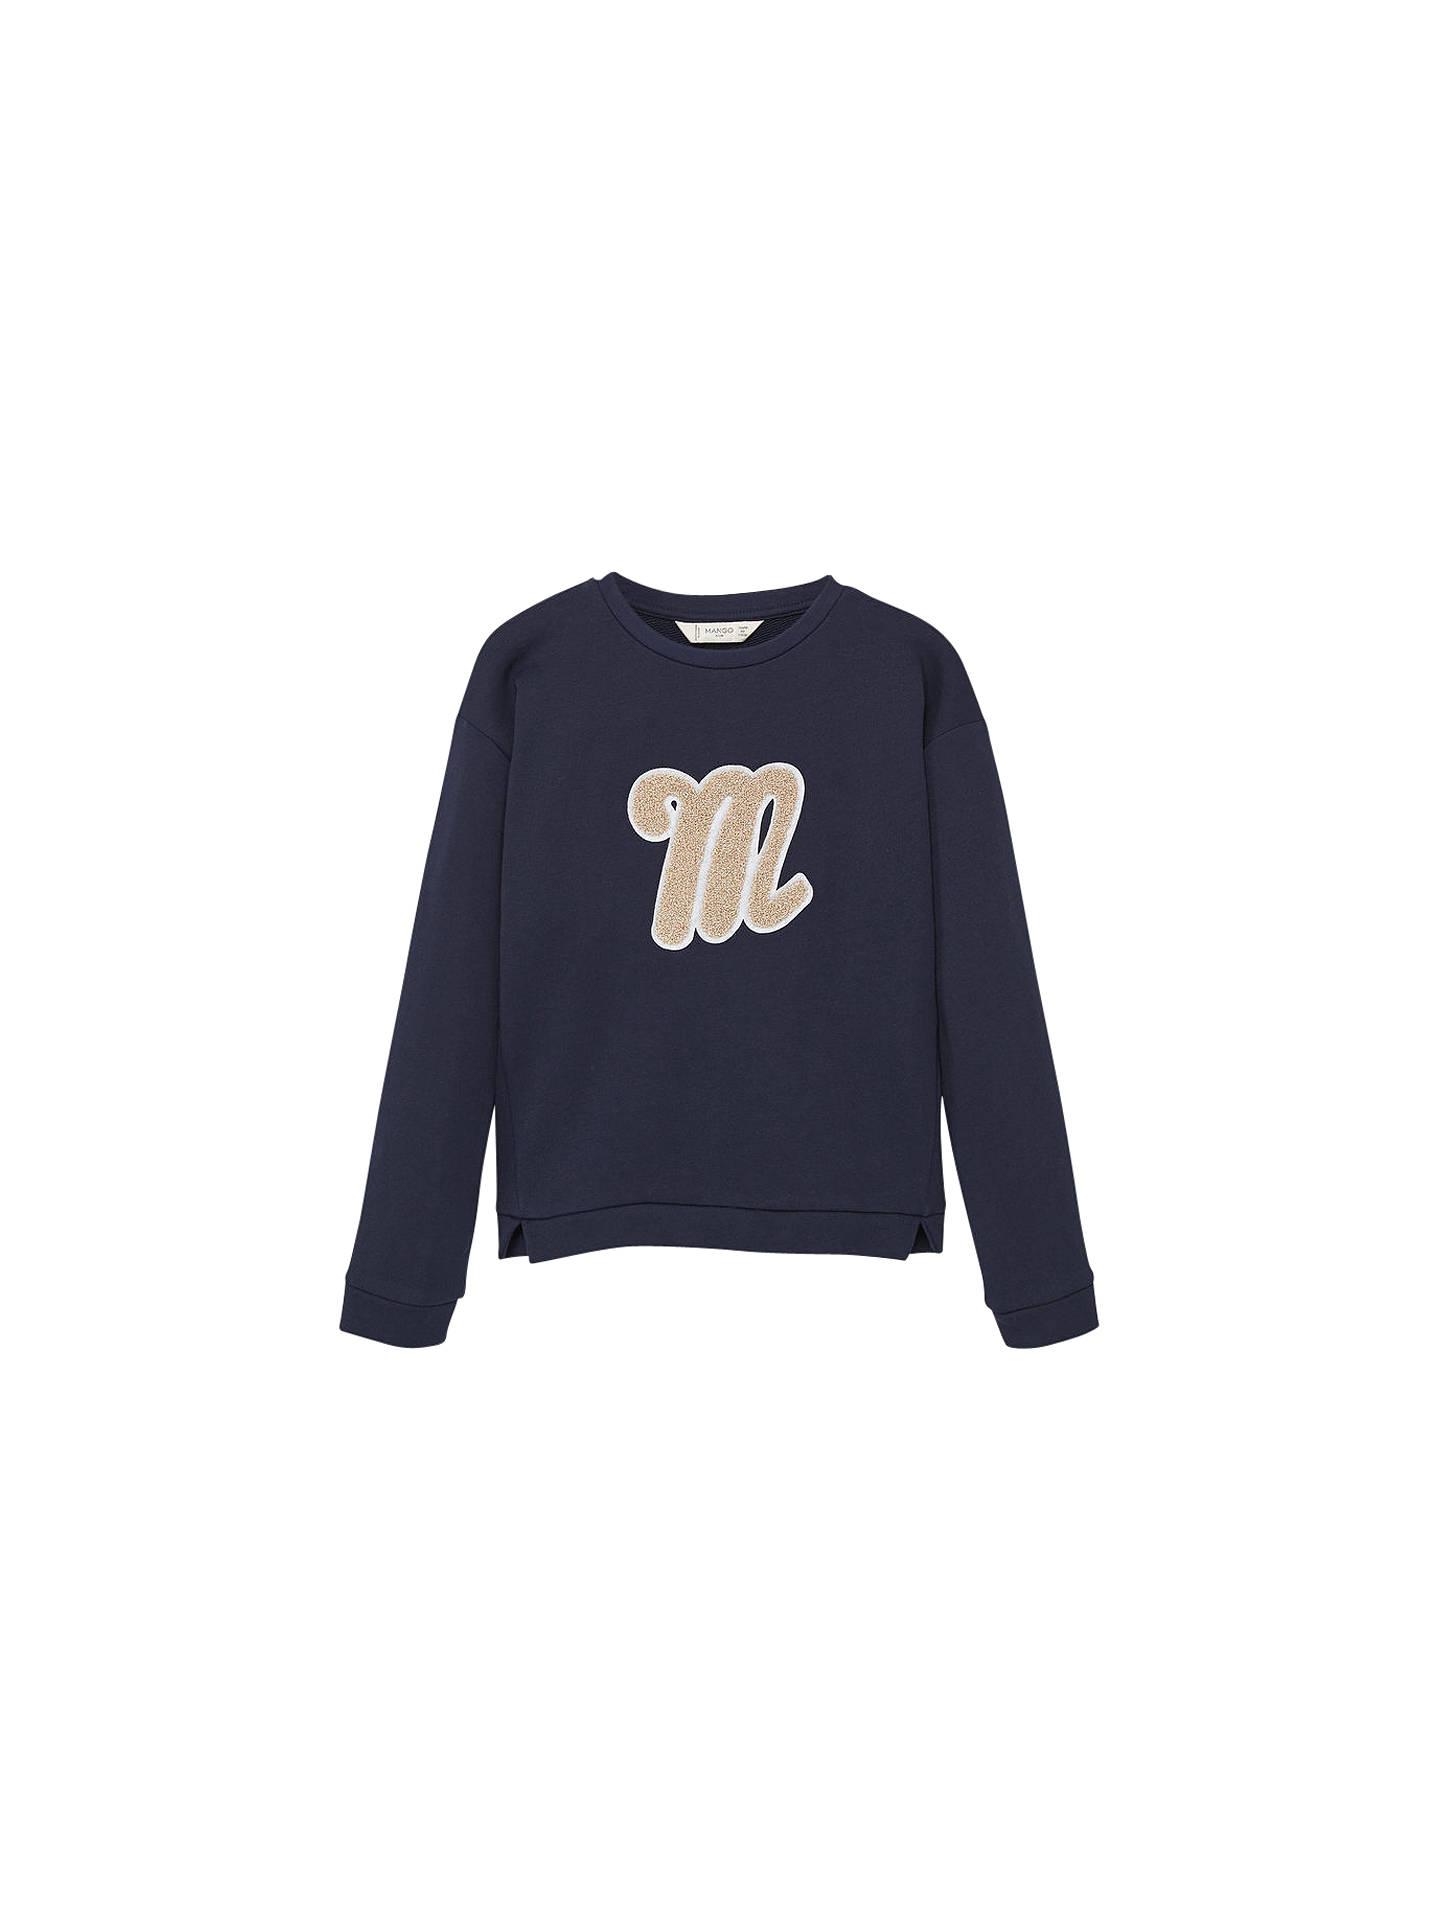 49d6e2b9b BuyMango Kids Girls' Logo Cotton Sweatshirt, Navy, 3 years Online at  johnlewis.